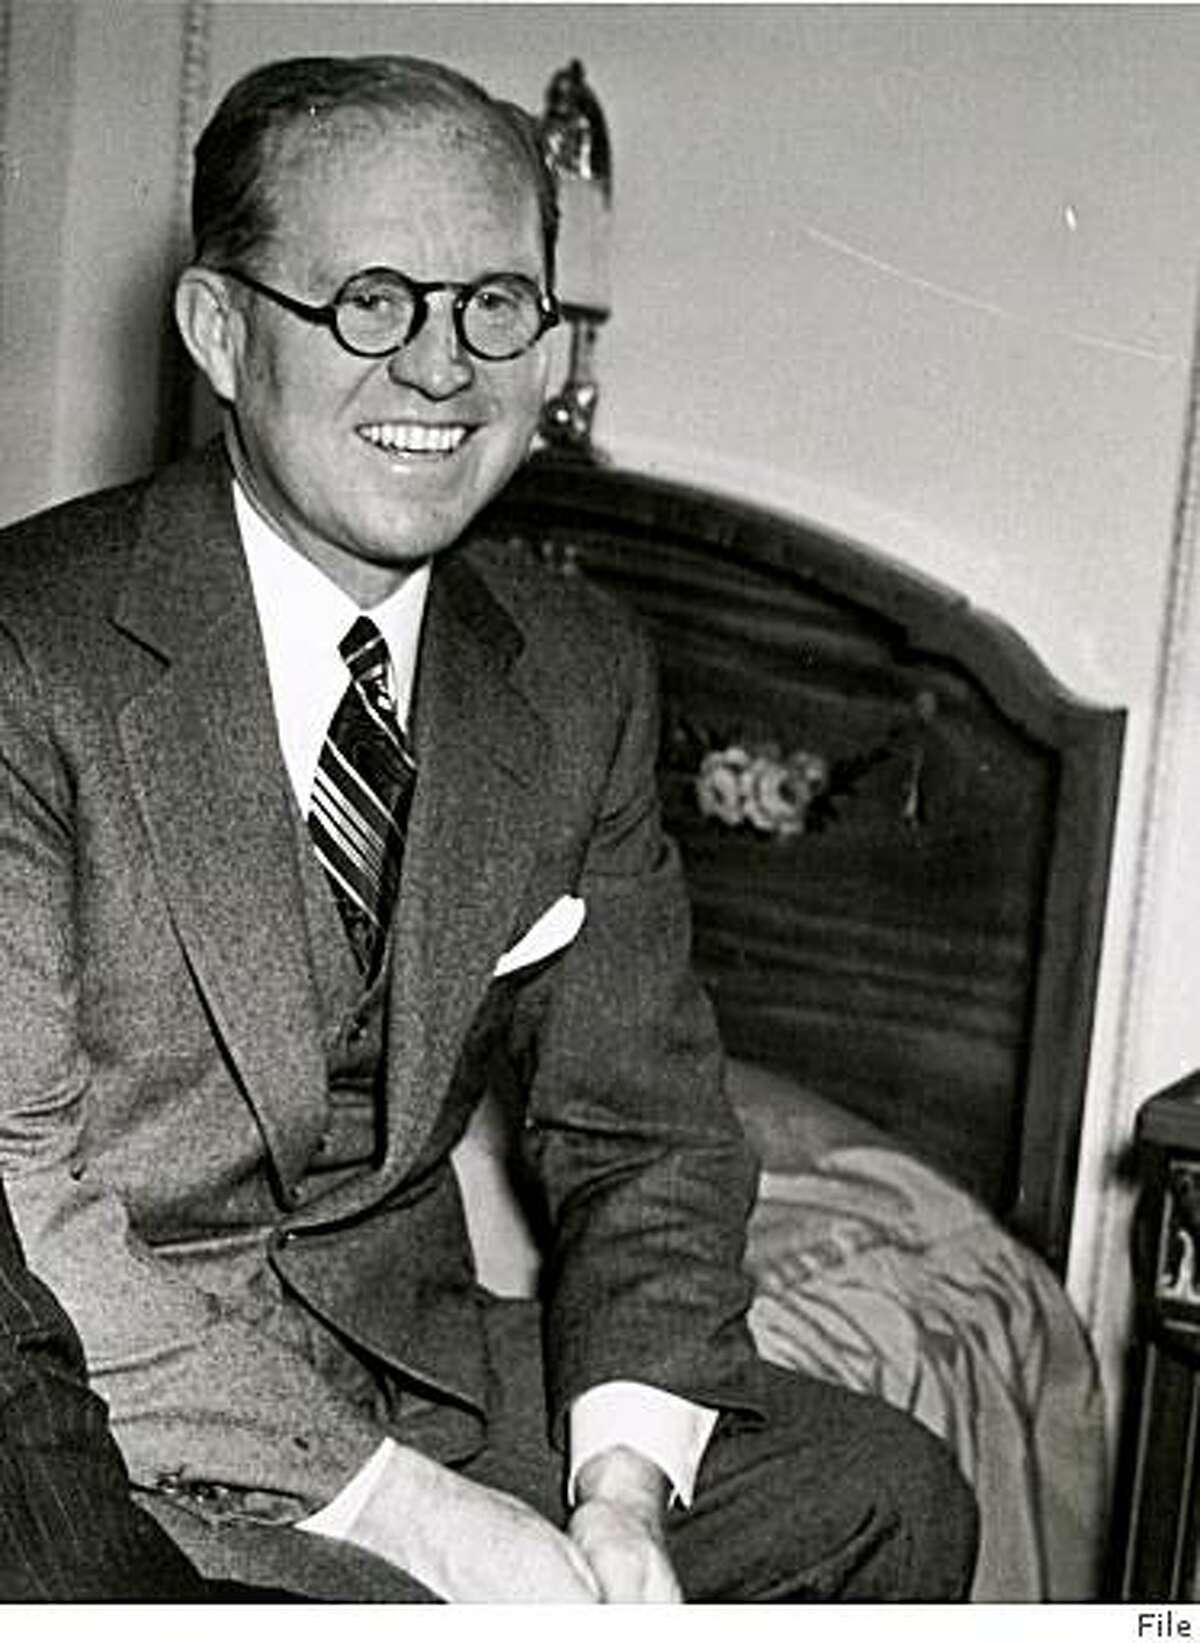 Joseph P. Kennedy ca. 1938 / File photo